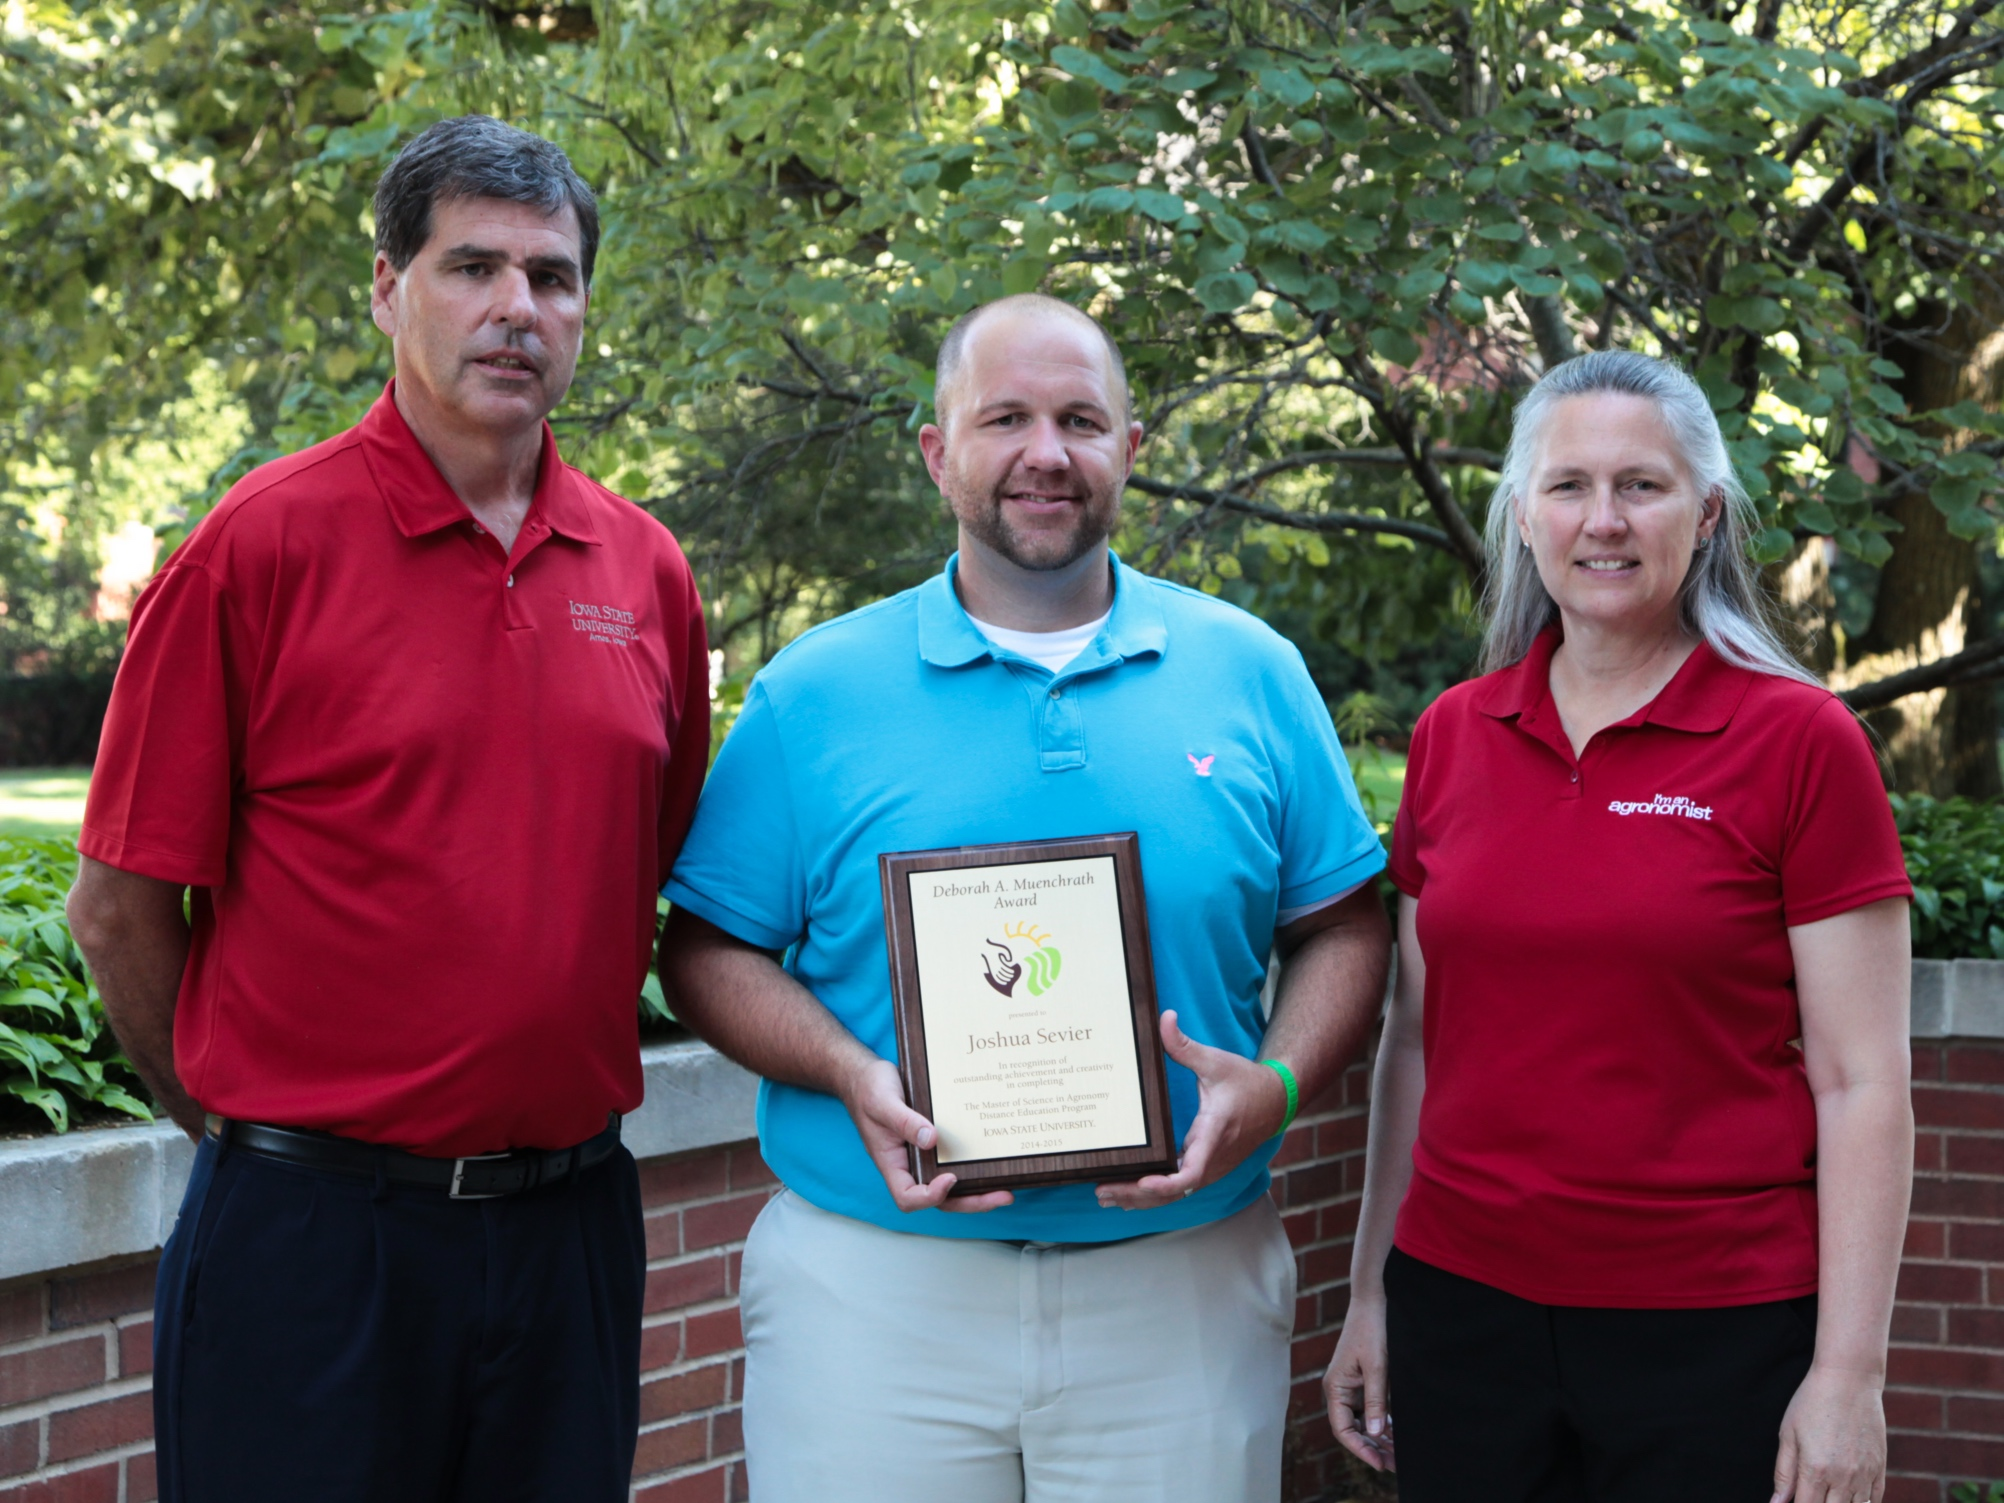 Sevier receiving Muenchrath award